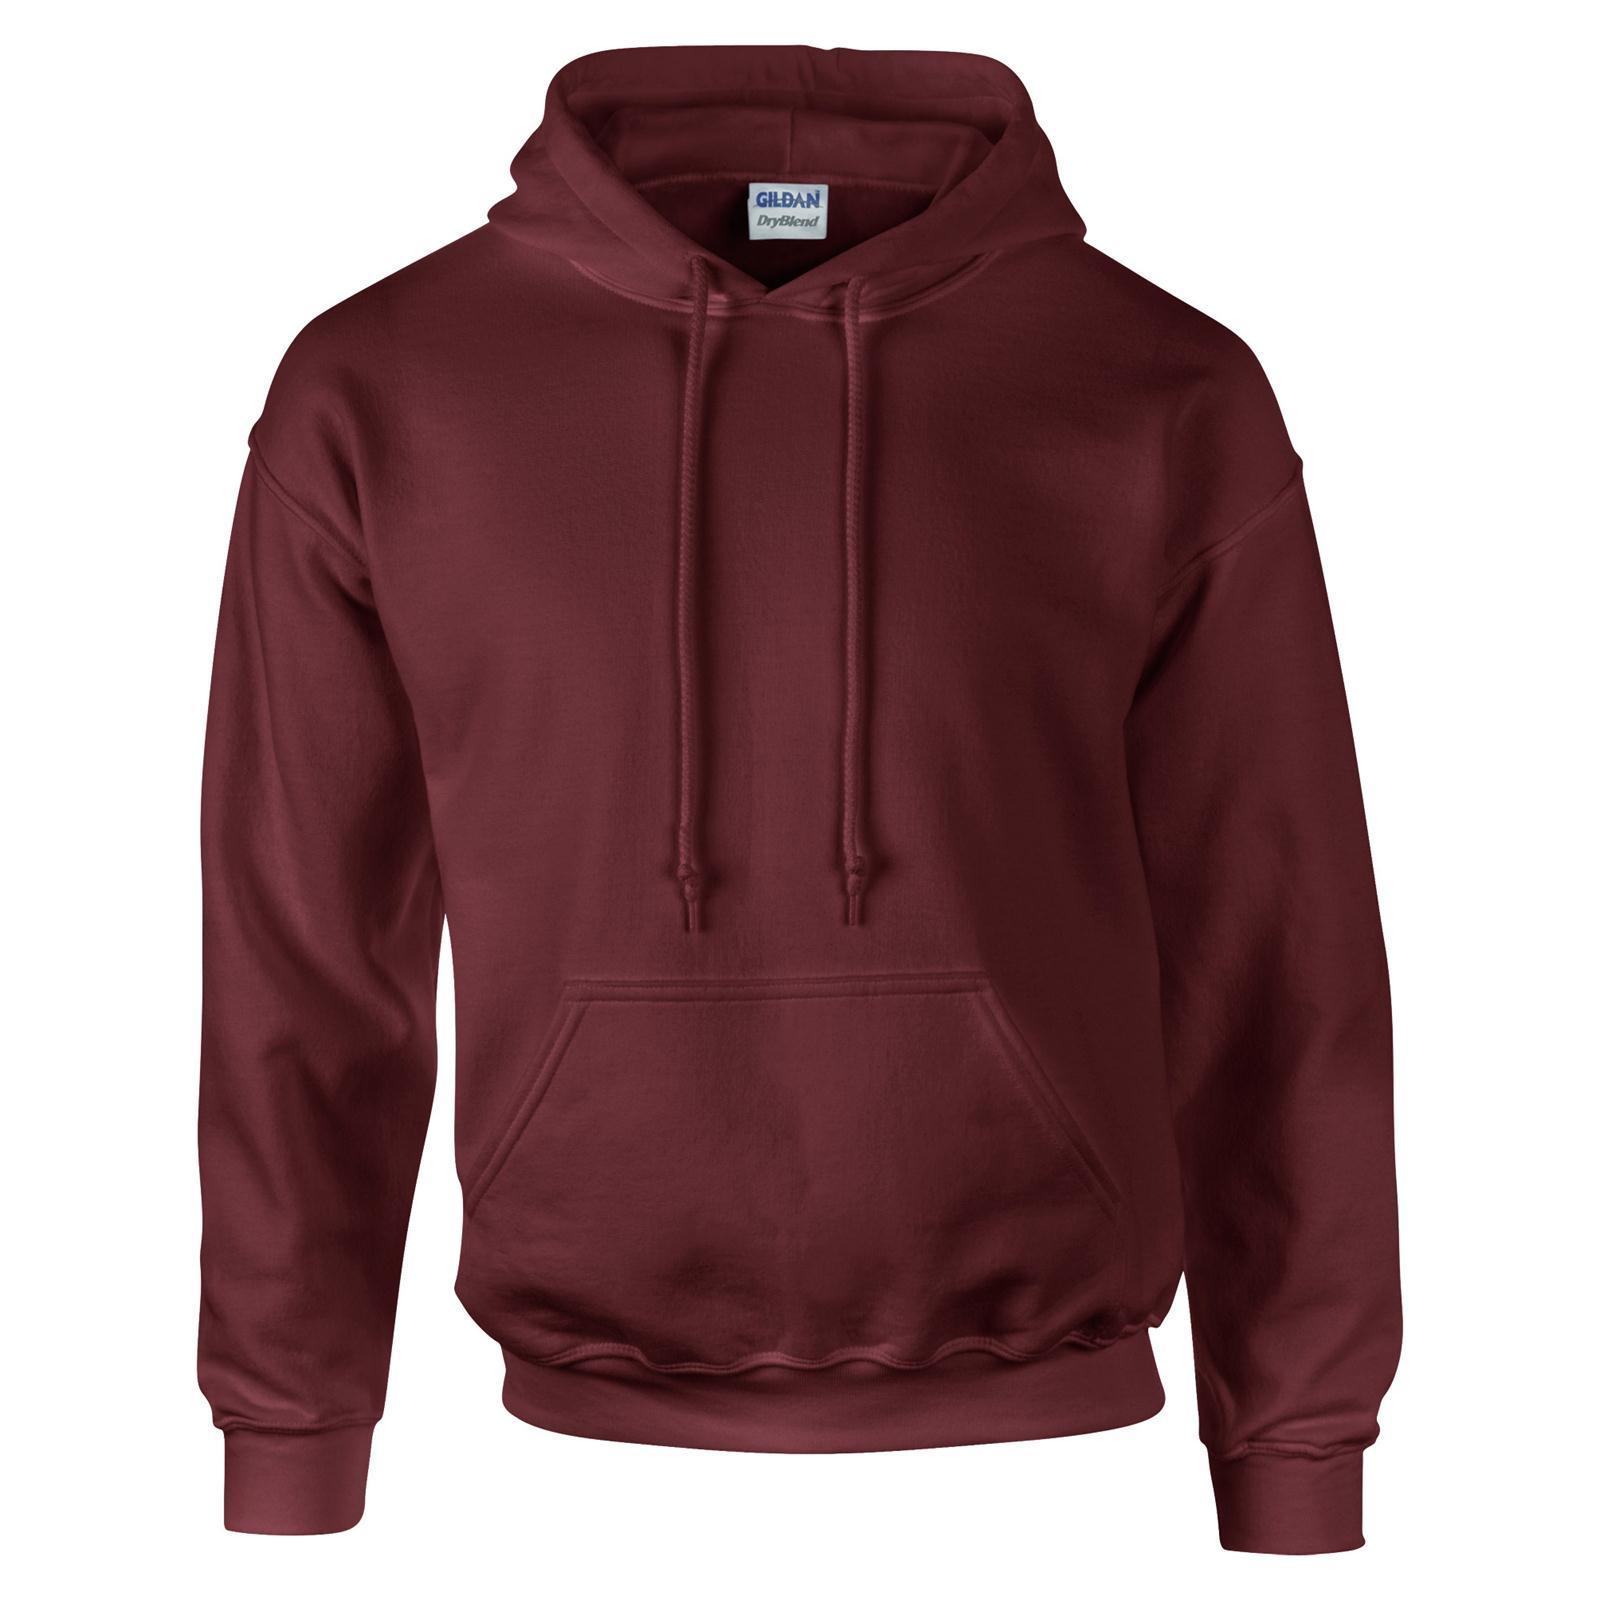 0d0ab1c71 GILDAN Unisex Adults Dry Blend Hoodie Hooded Sweatshirt 14 Colours ...